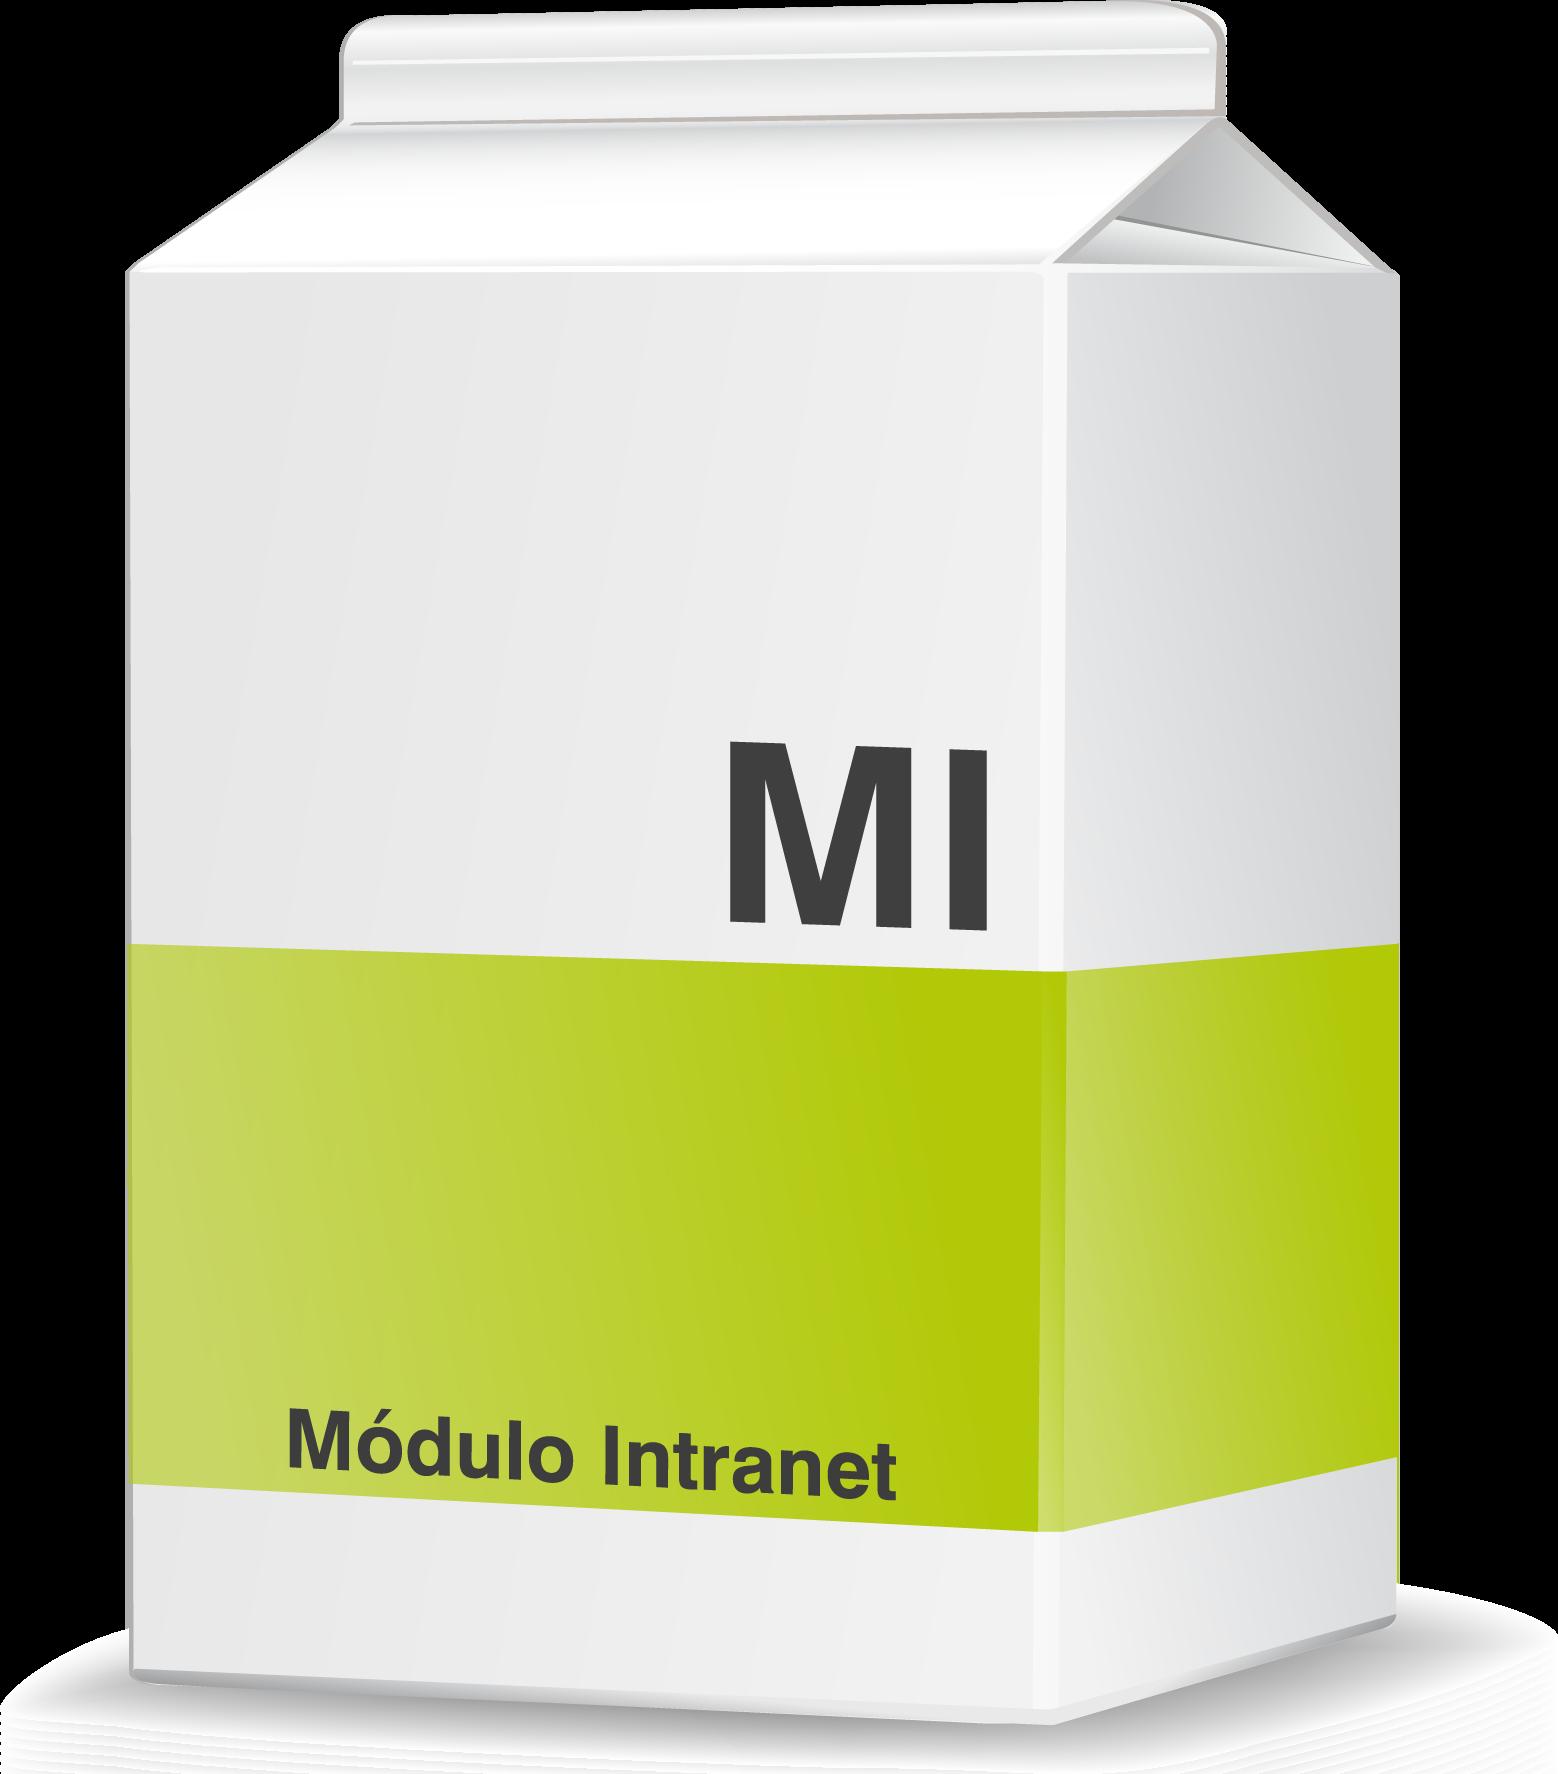 Mdulo Intranet Web